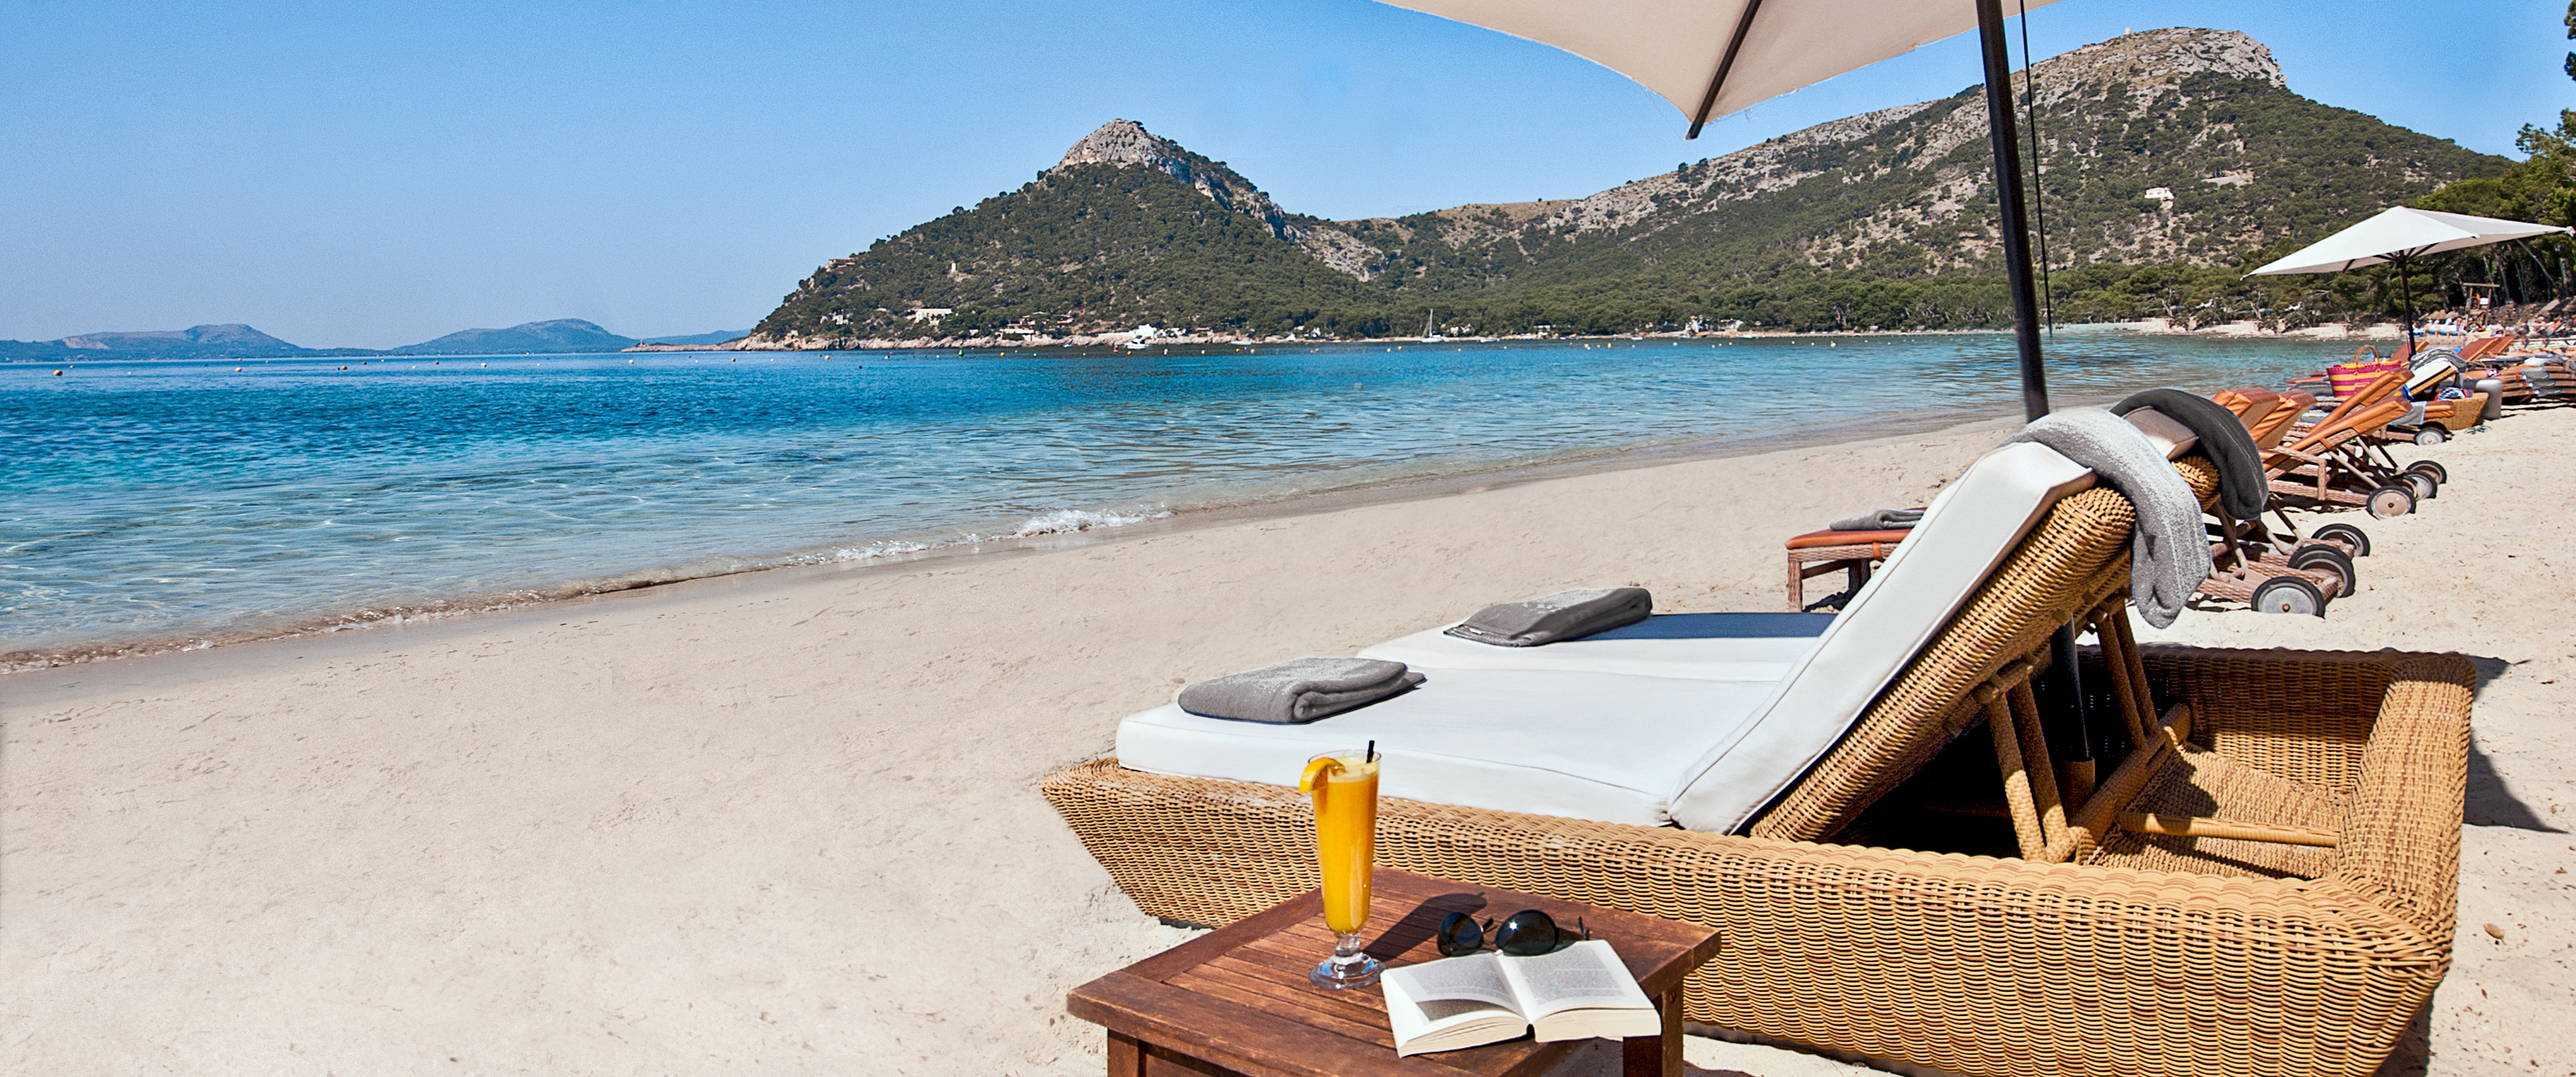 royal-hideaway-formentor-beach